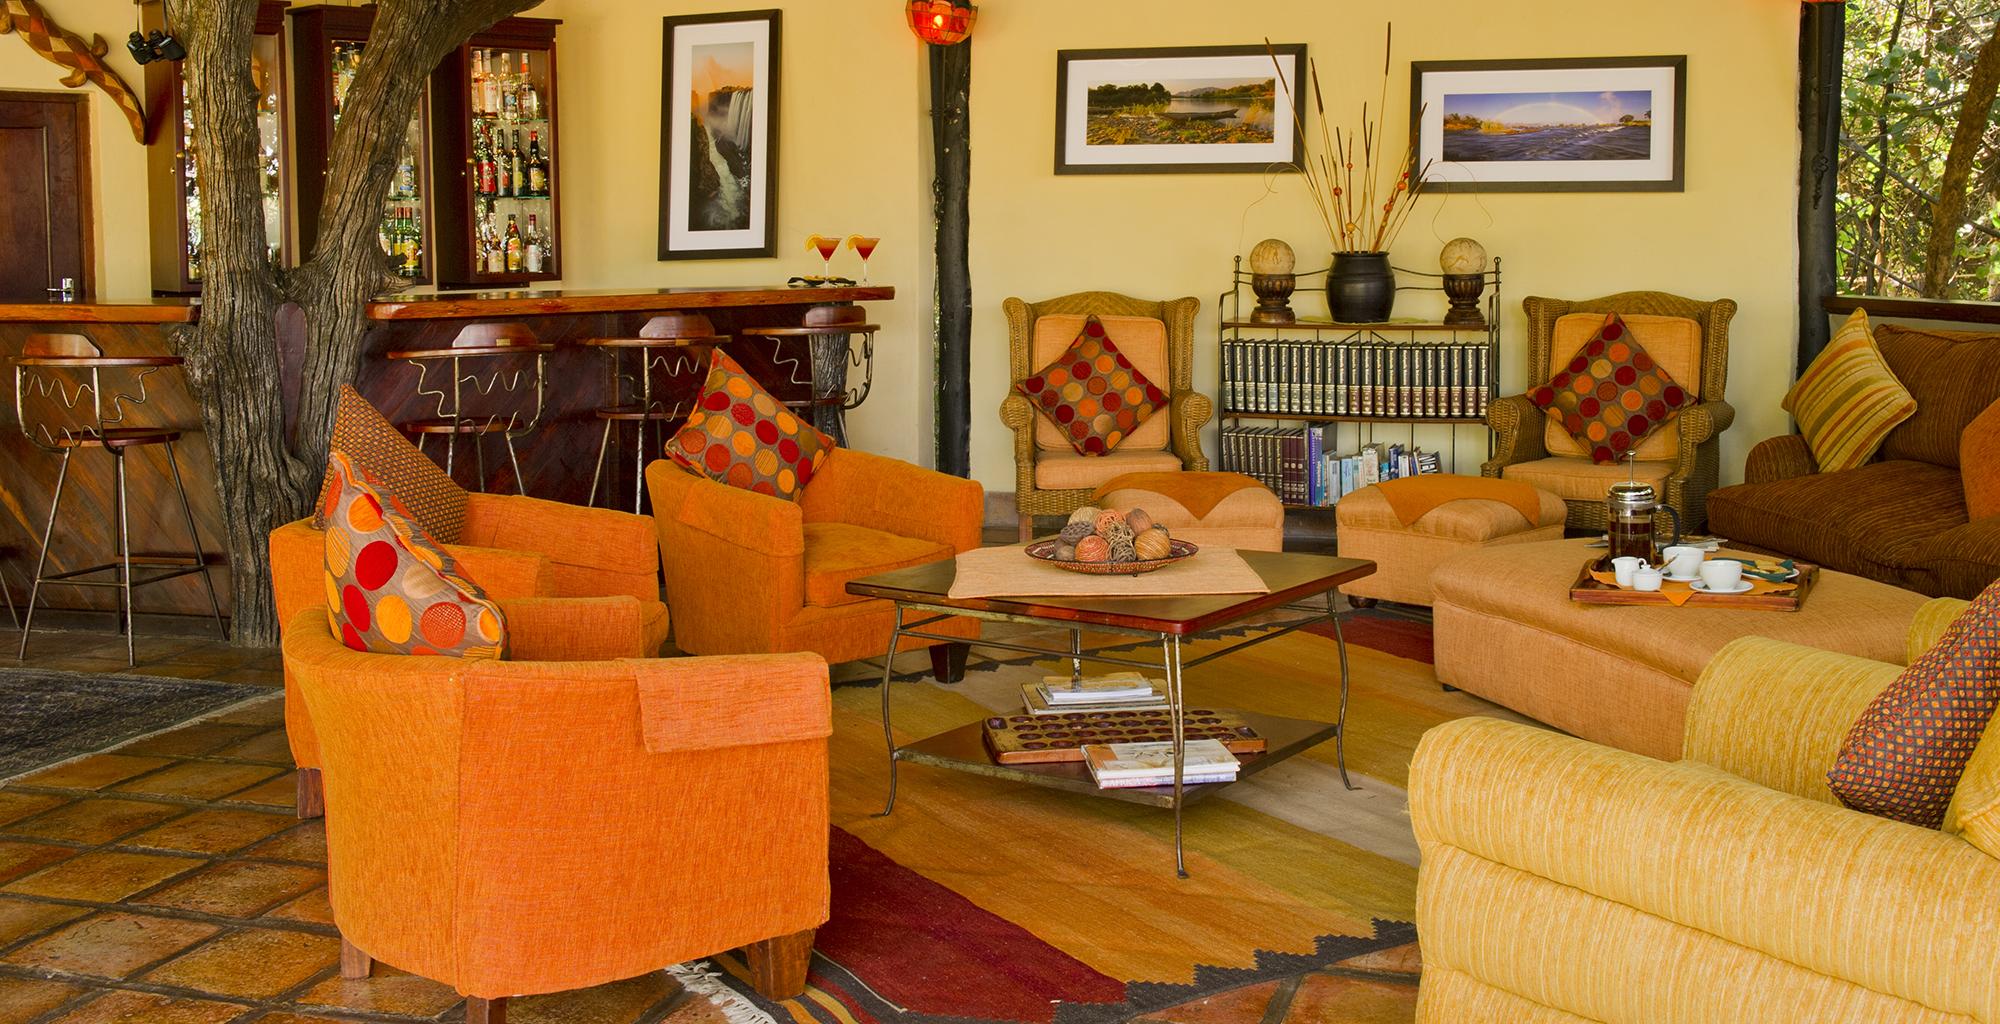 Zambia-Islands-of-Siankaba-Lounge